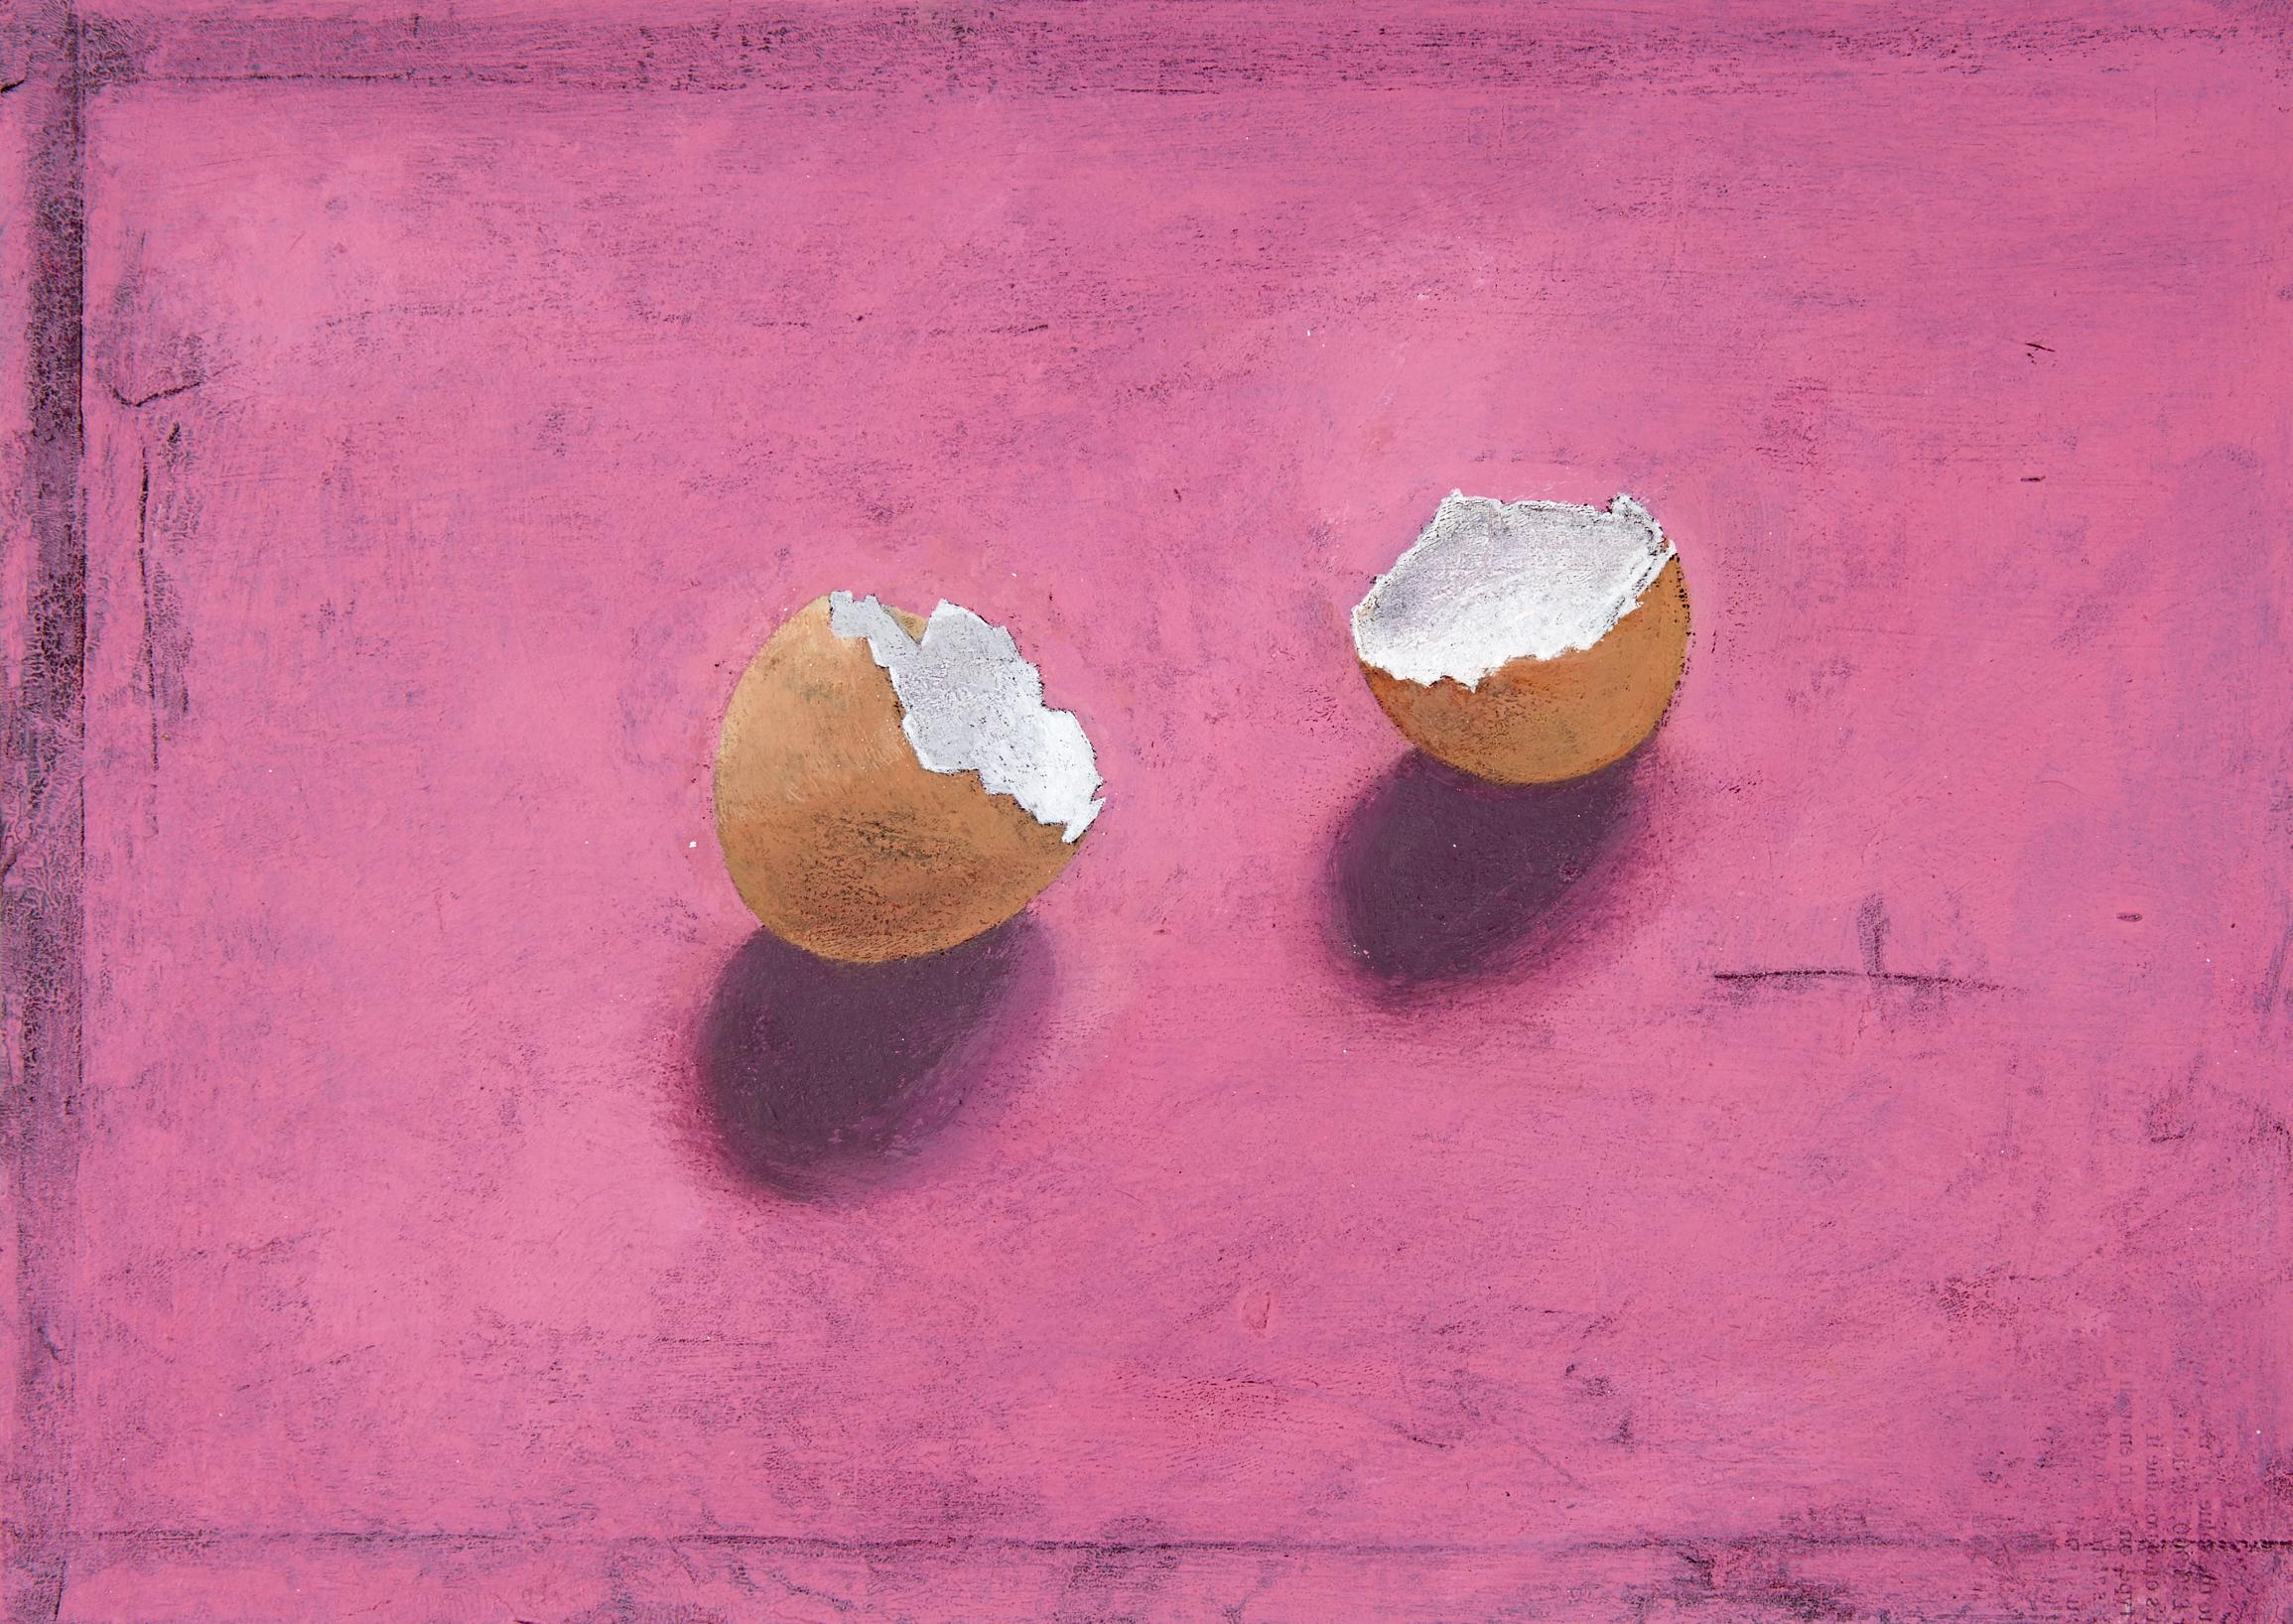 David Lyon Art - Pink Eggshells - 150dpi.jpg